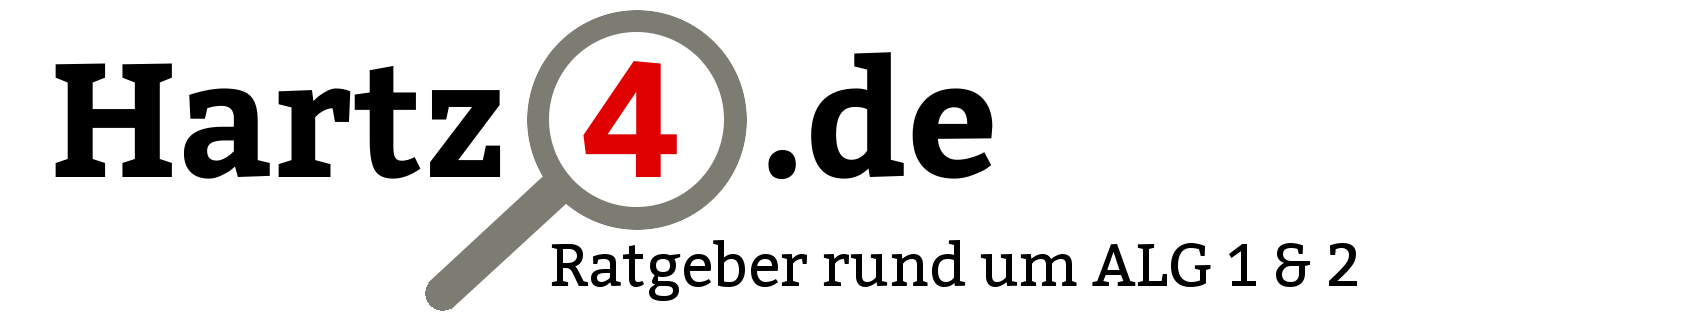 logo - Widerspruch Jobcenter Ruckzahlung Muster